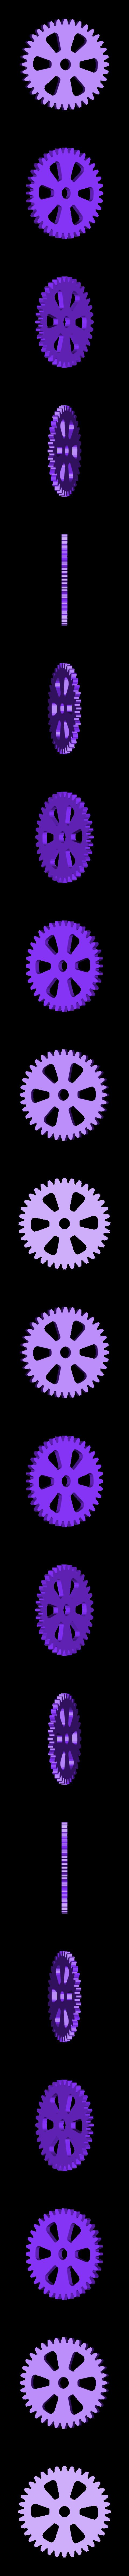 ing cover 12.stl Download free STL file cover gears for xiaomi mi A1 • 3D print object, Delli98